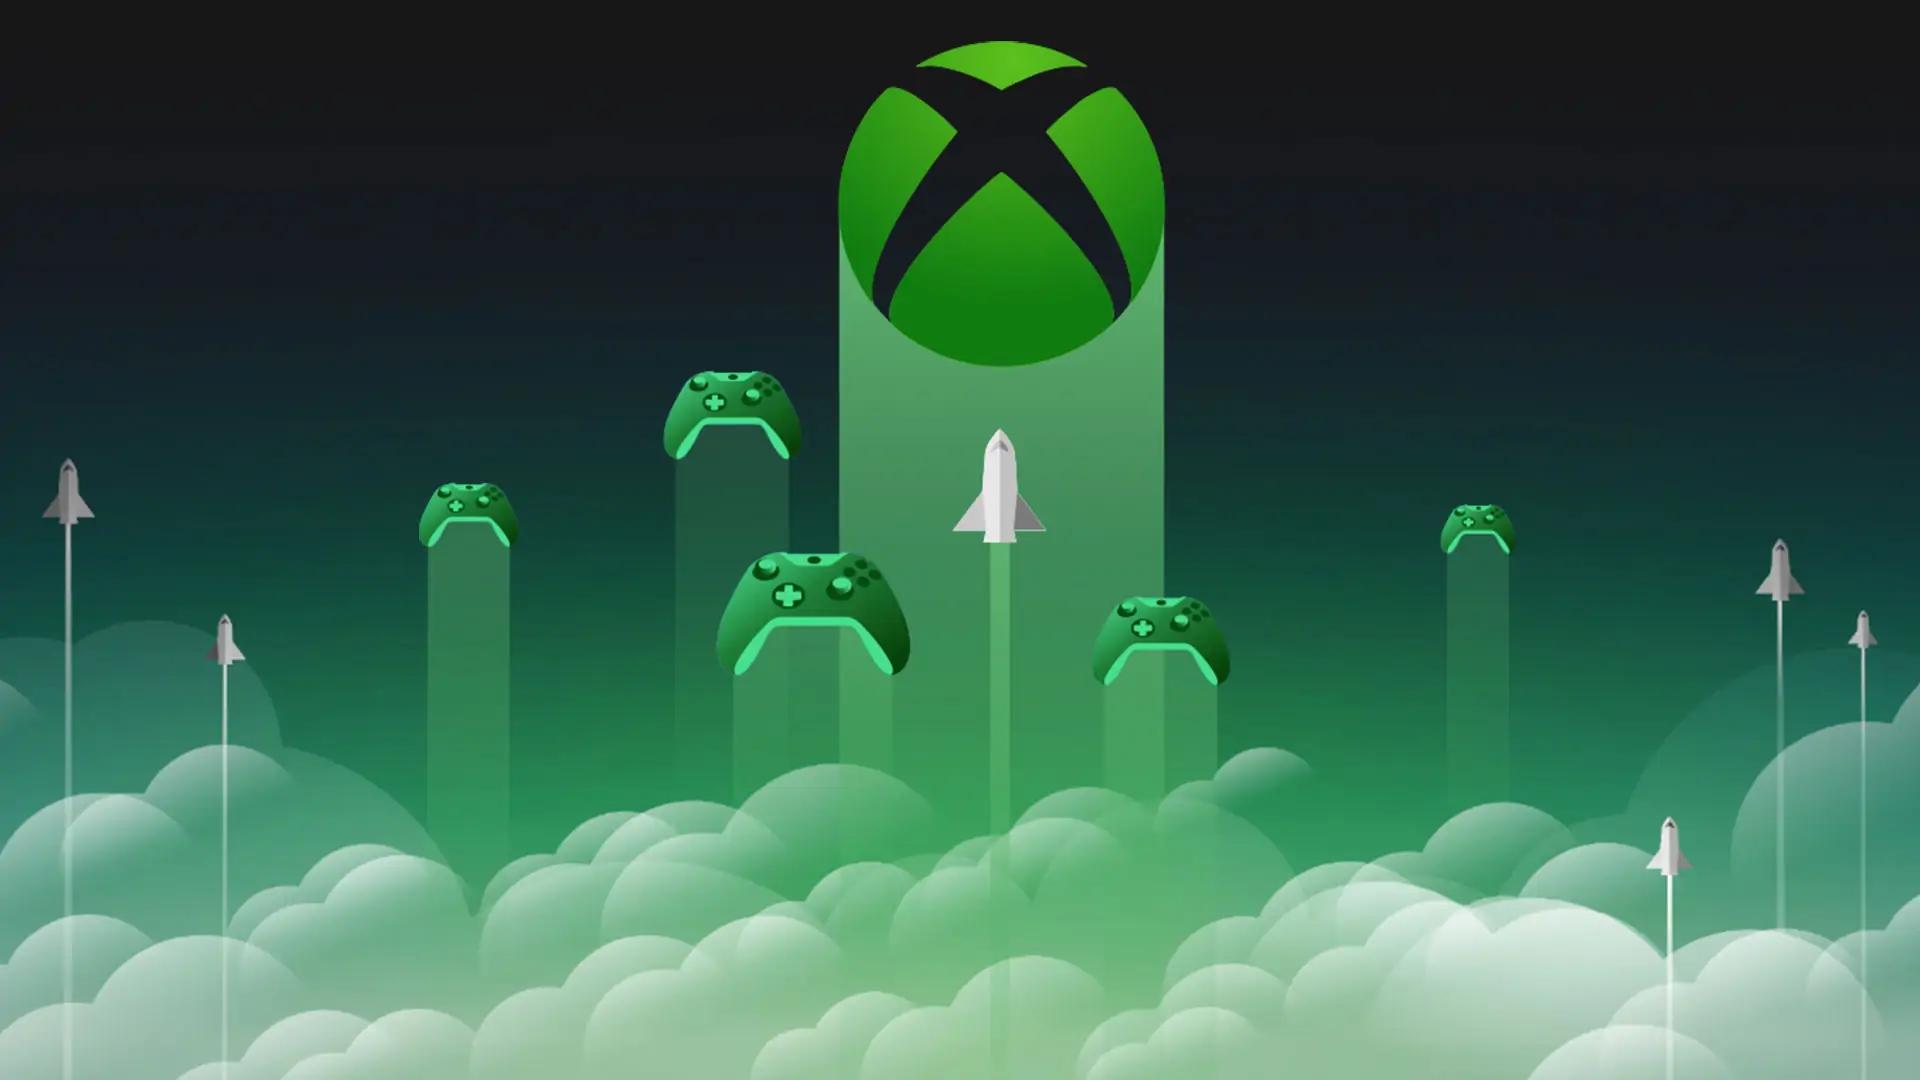 Microsoft анонсировала специальный комплект Xbox Game Pass Ultimate для Galaxy Note 20